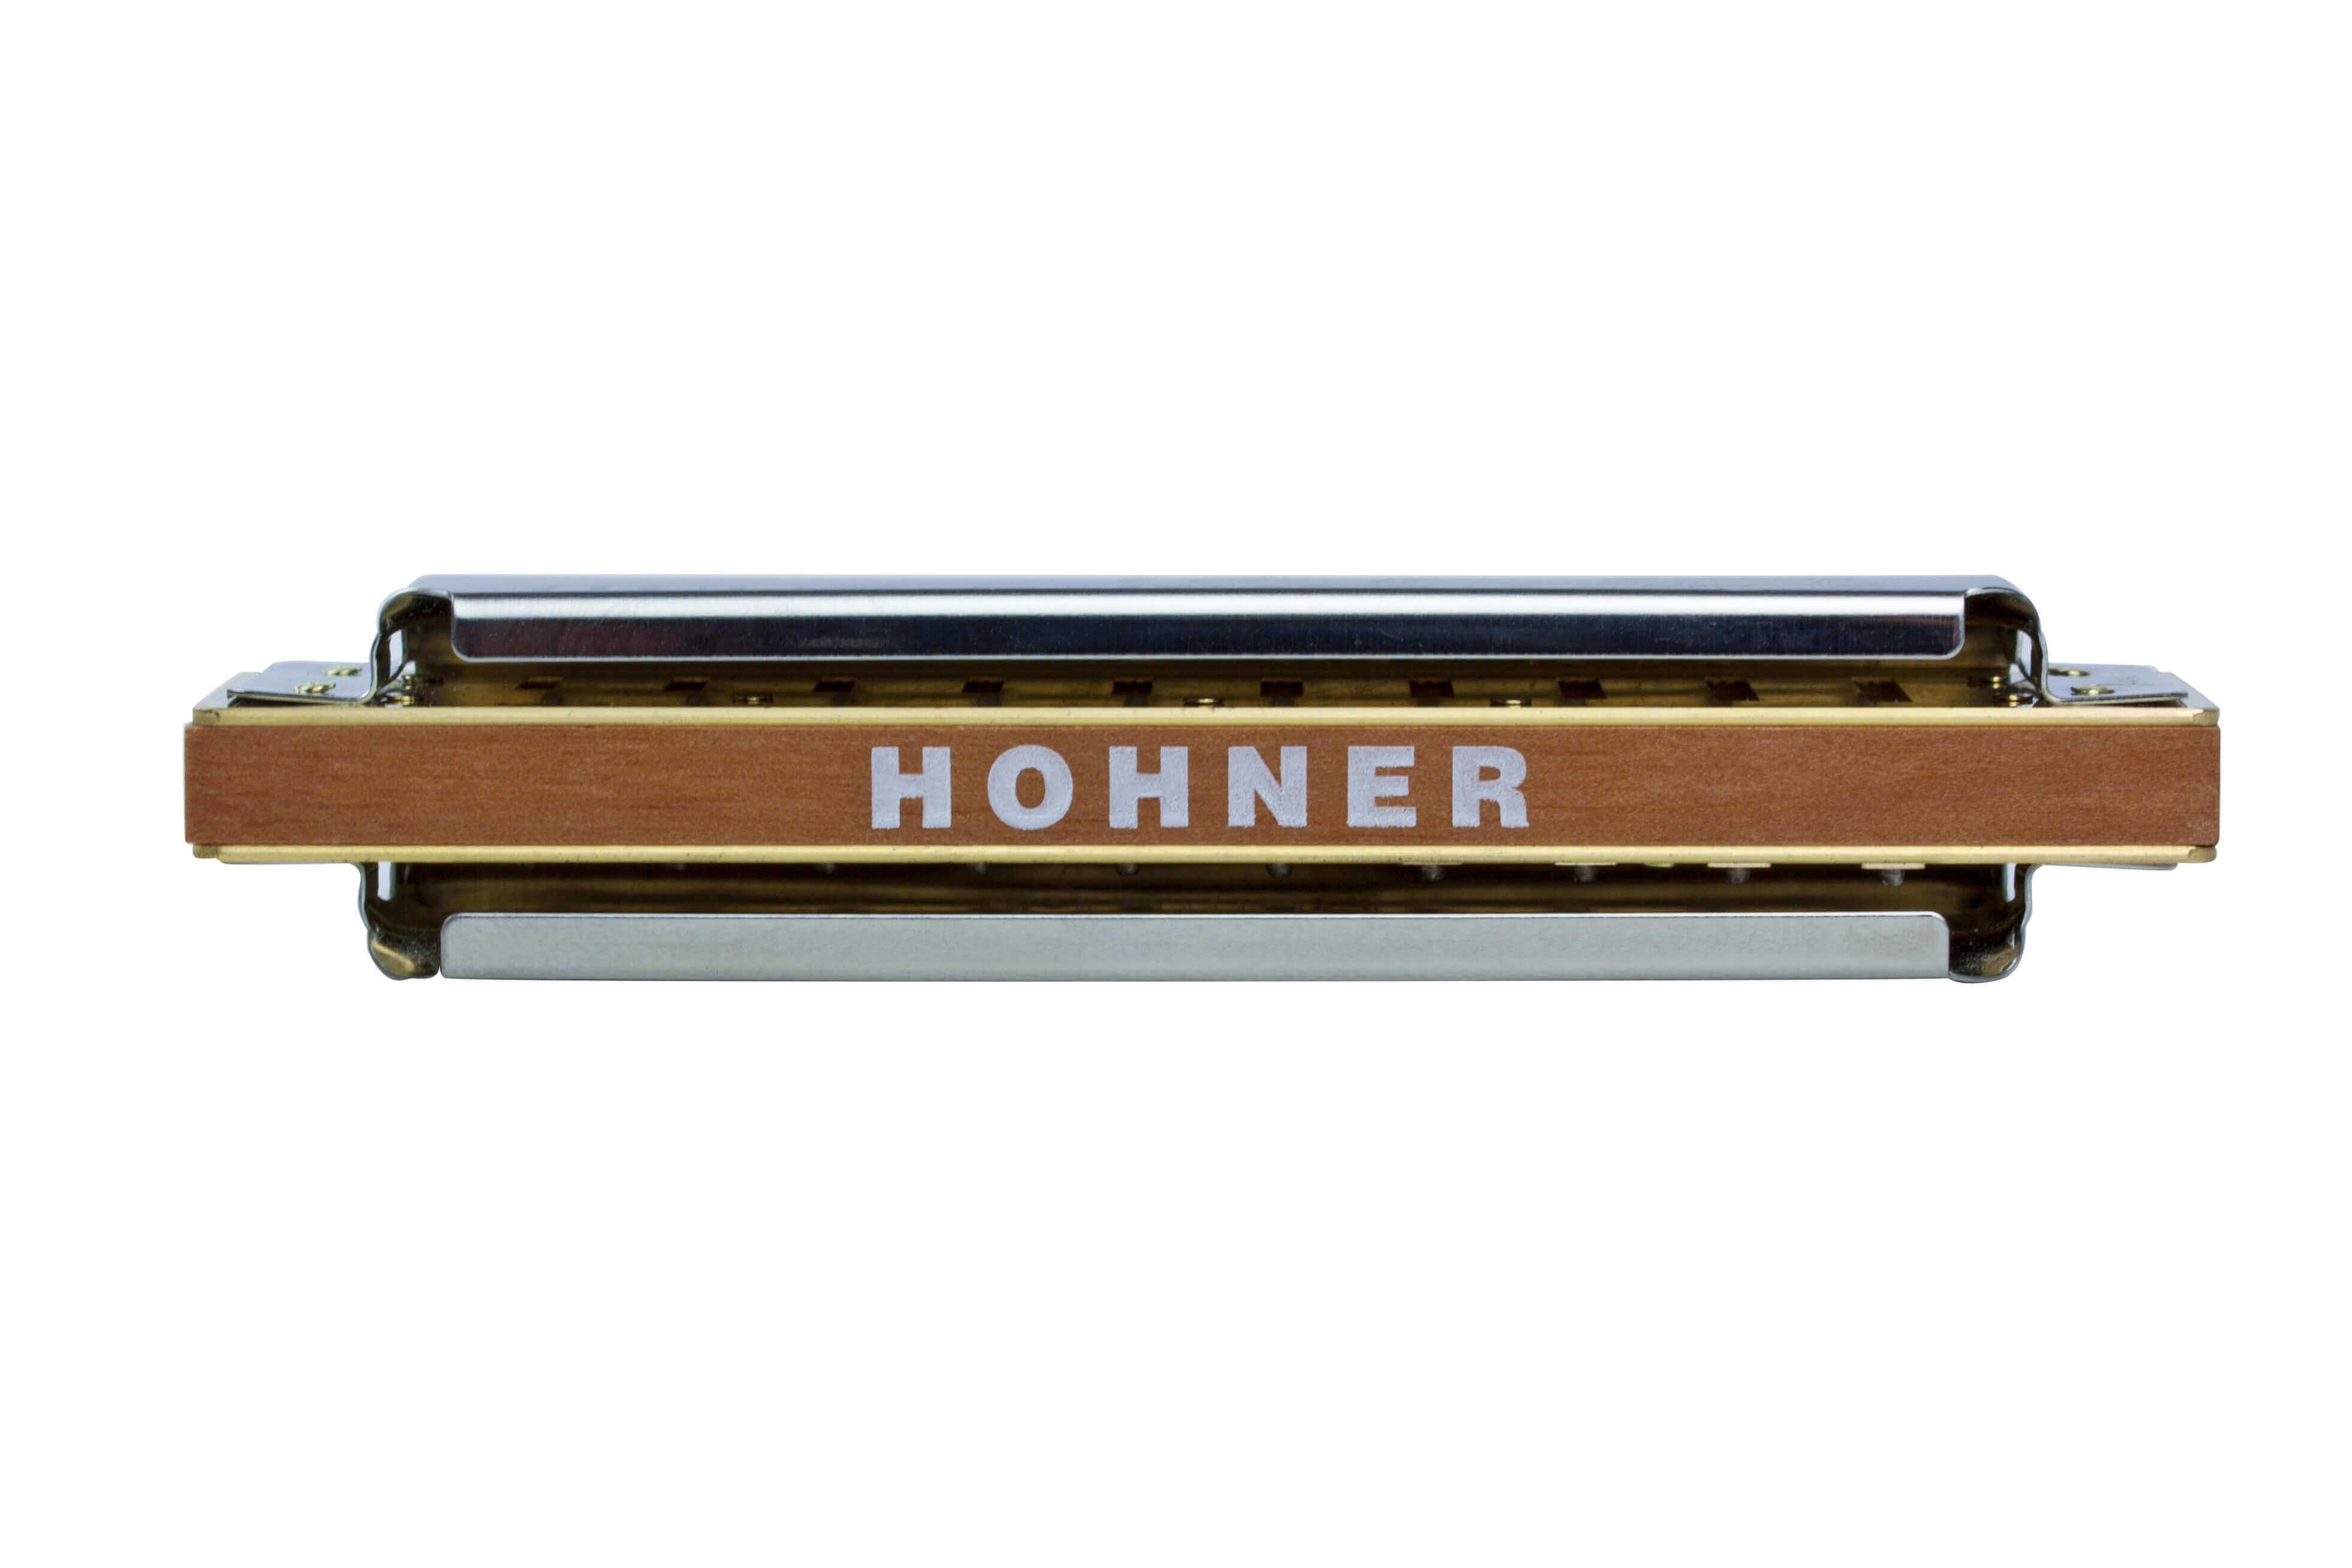 Armónica Hohner Marine Band 1896/20